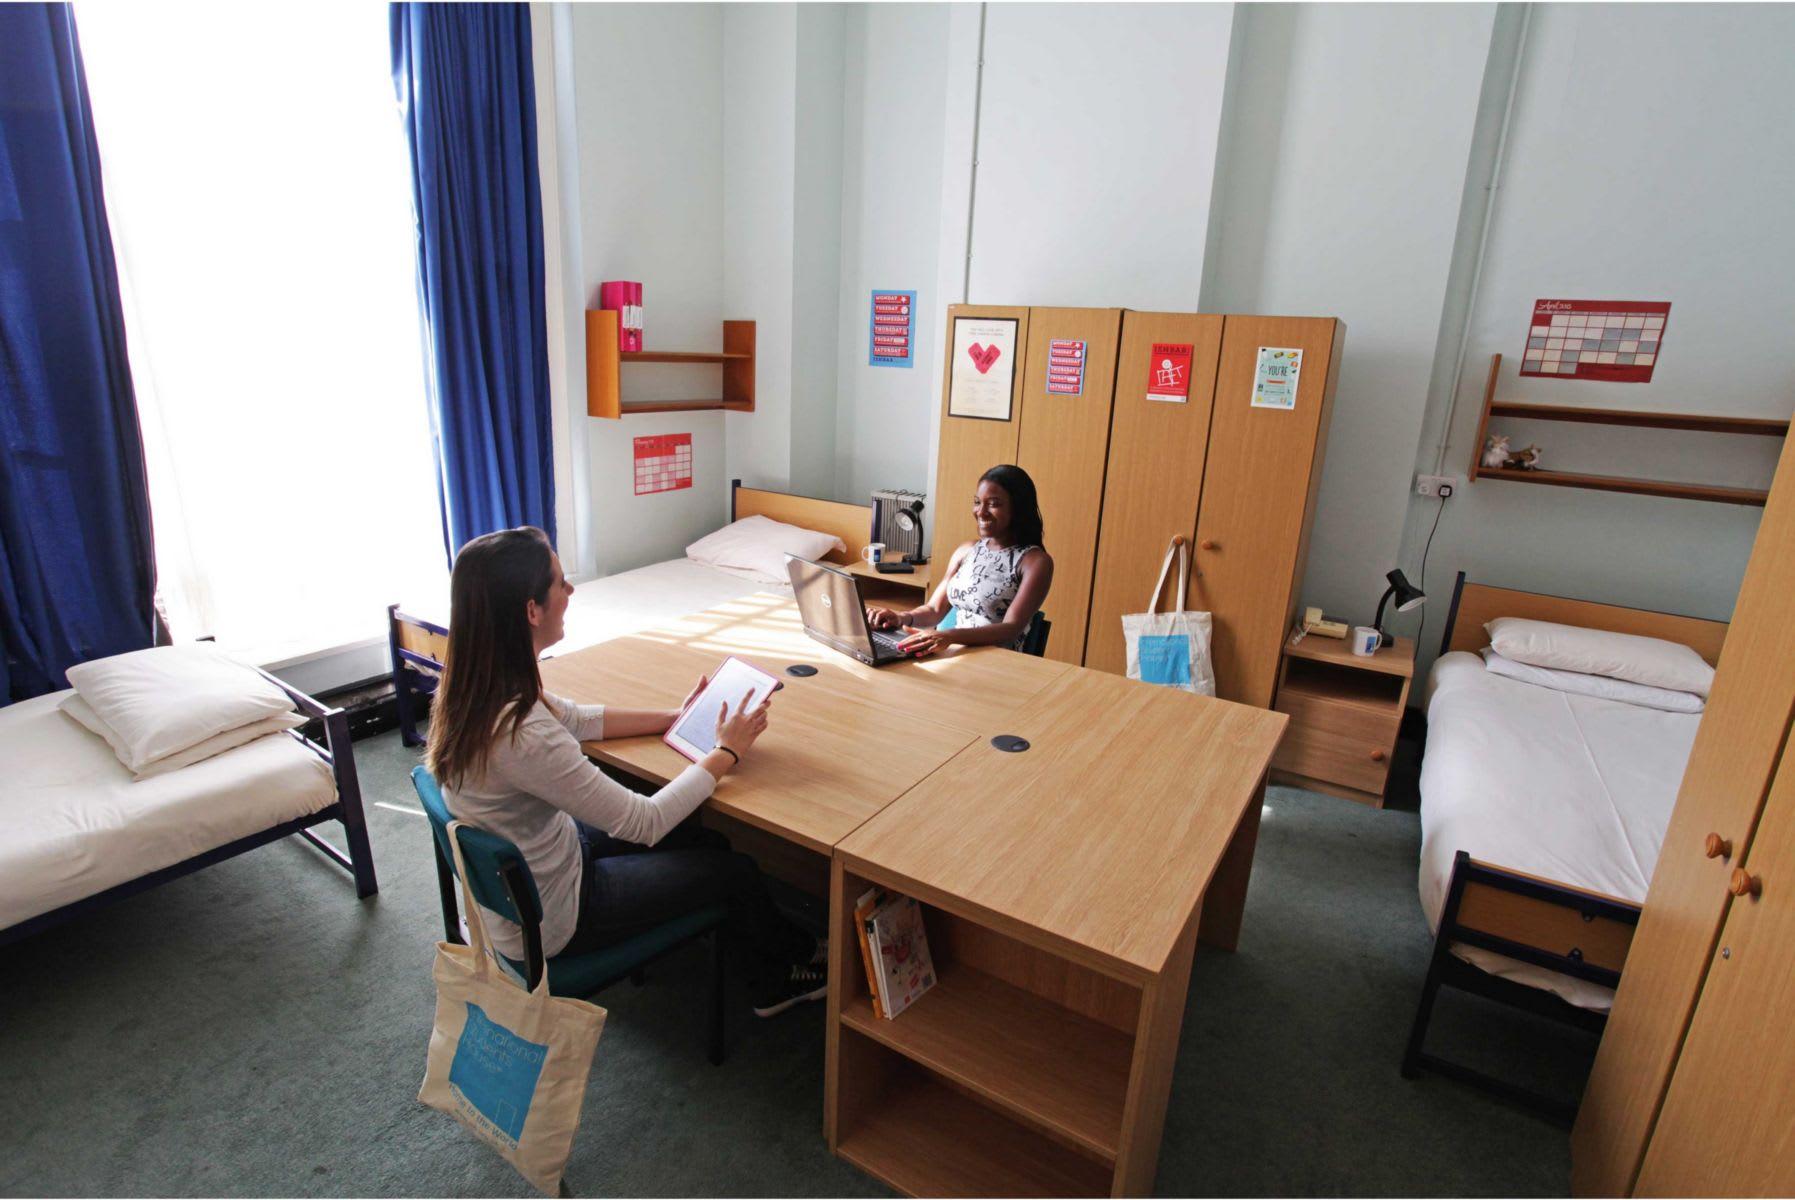 HOSTEL - International Students House